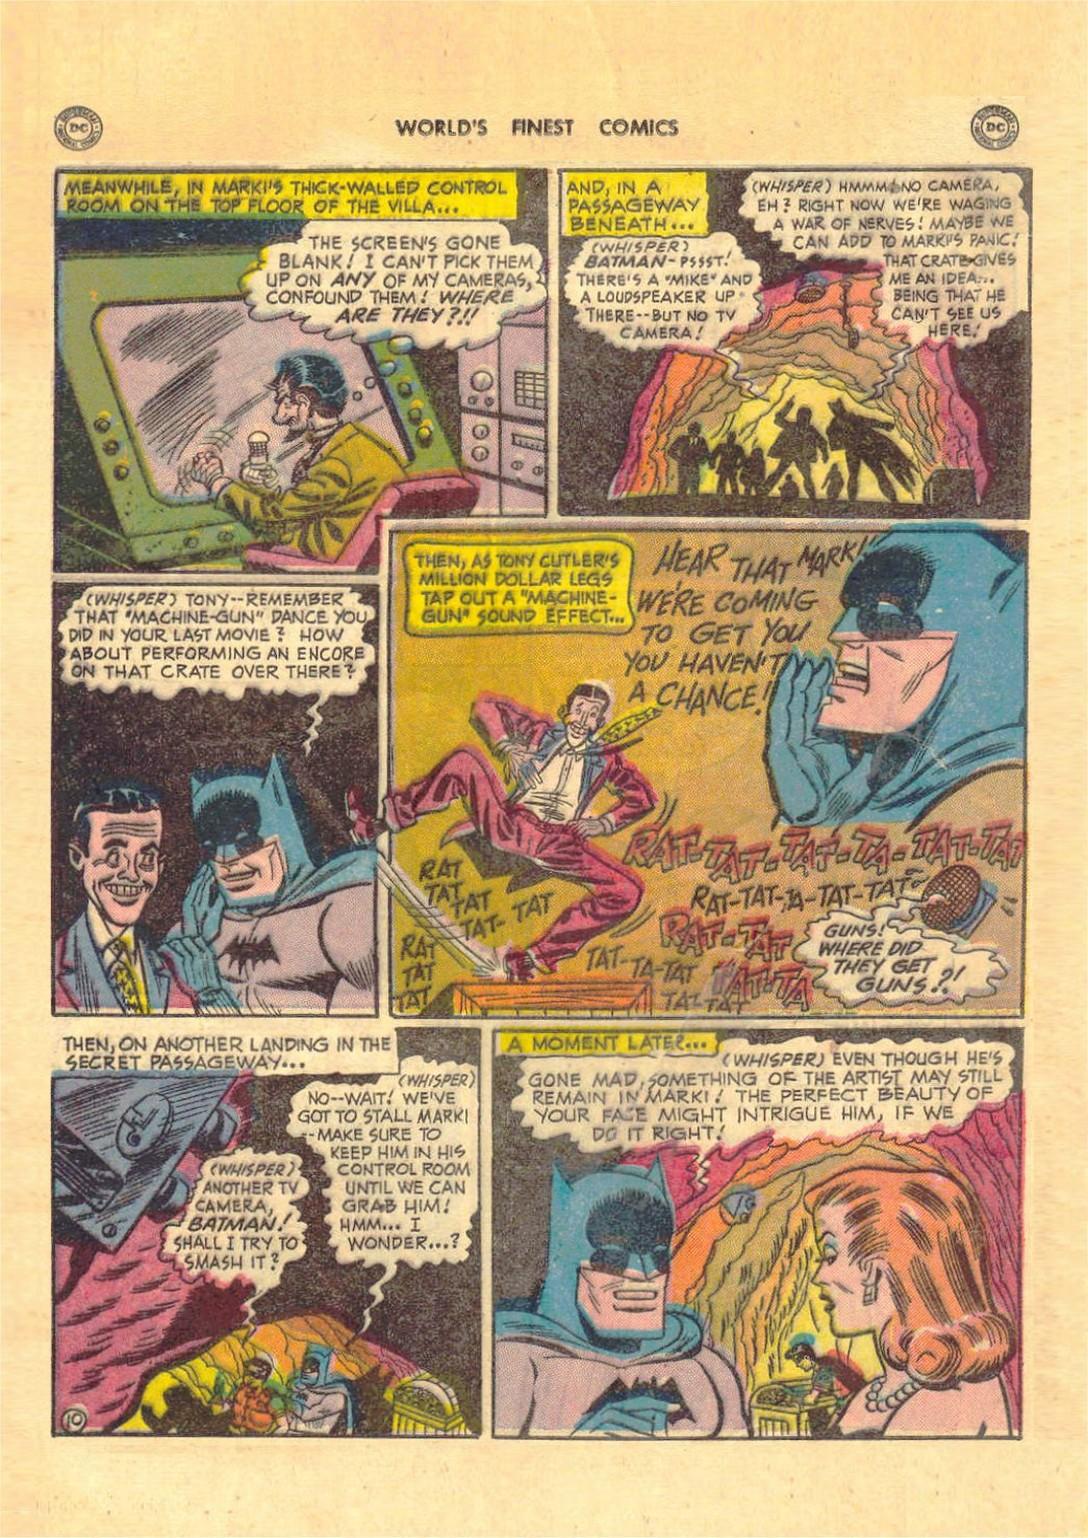 Read online World's Finest Comics comic -  Issue #52 - 72